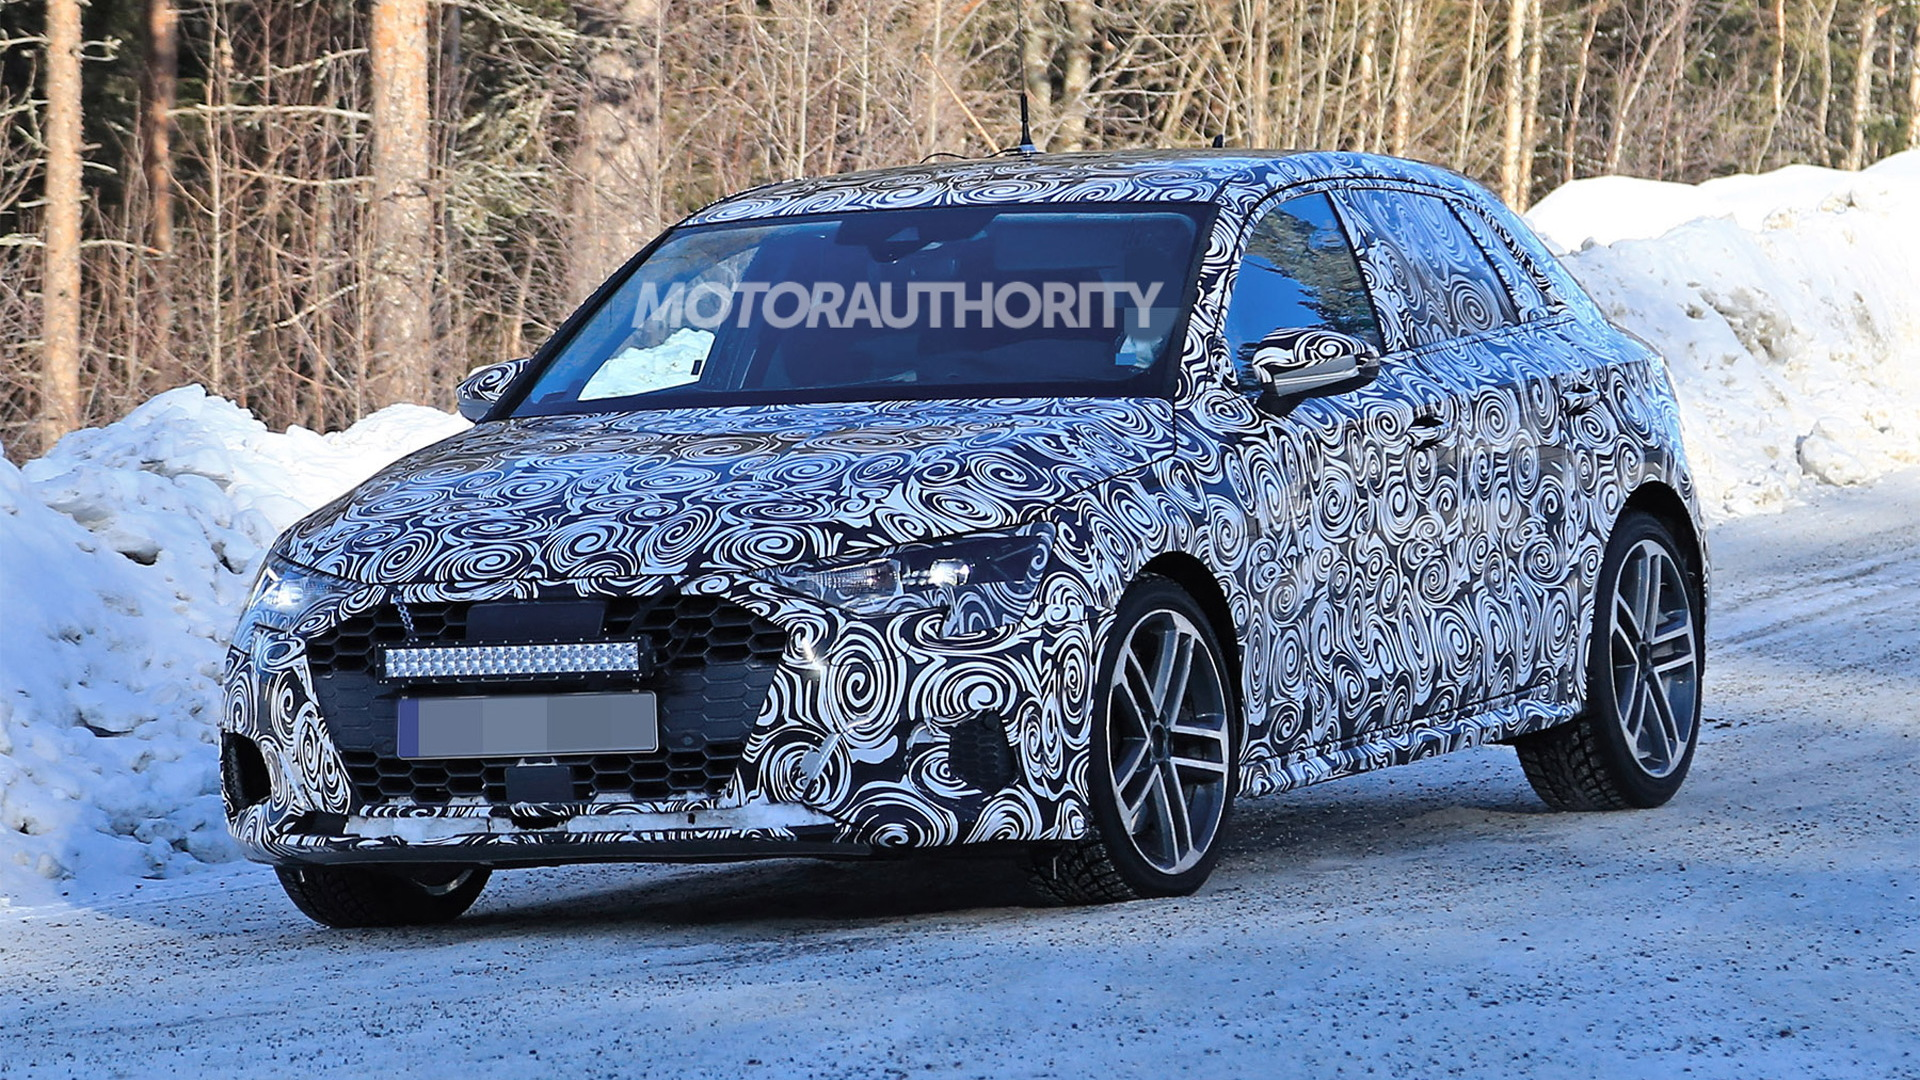 2021 Audi S3 Sportback spy shots - Image via S. Baldauf/SB-Medien